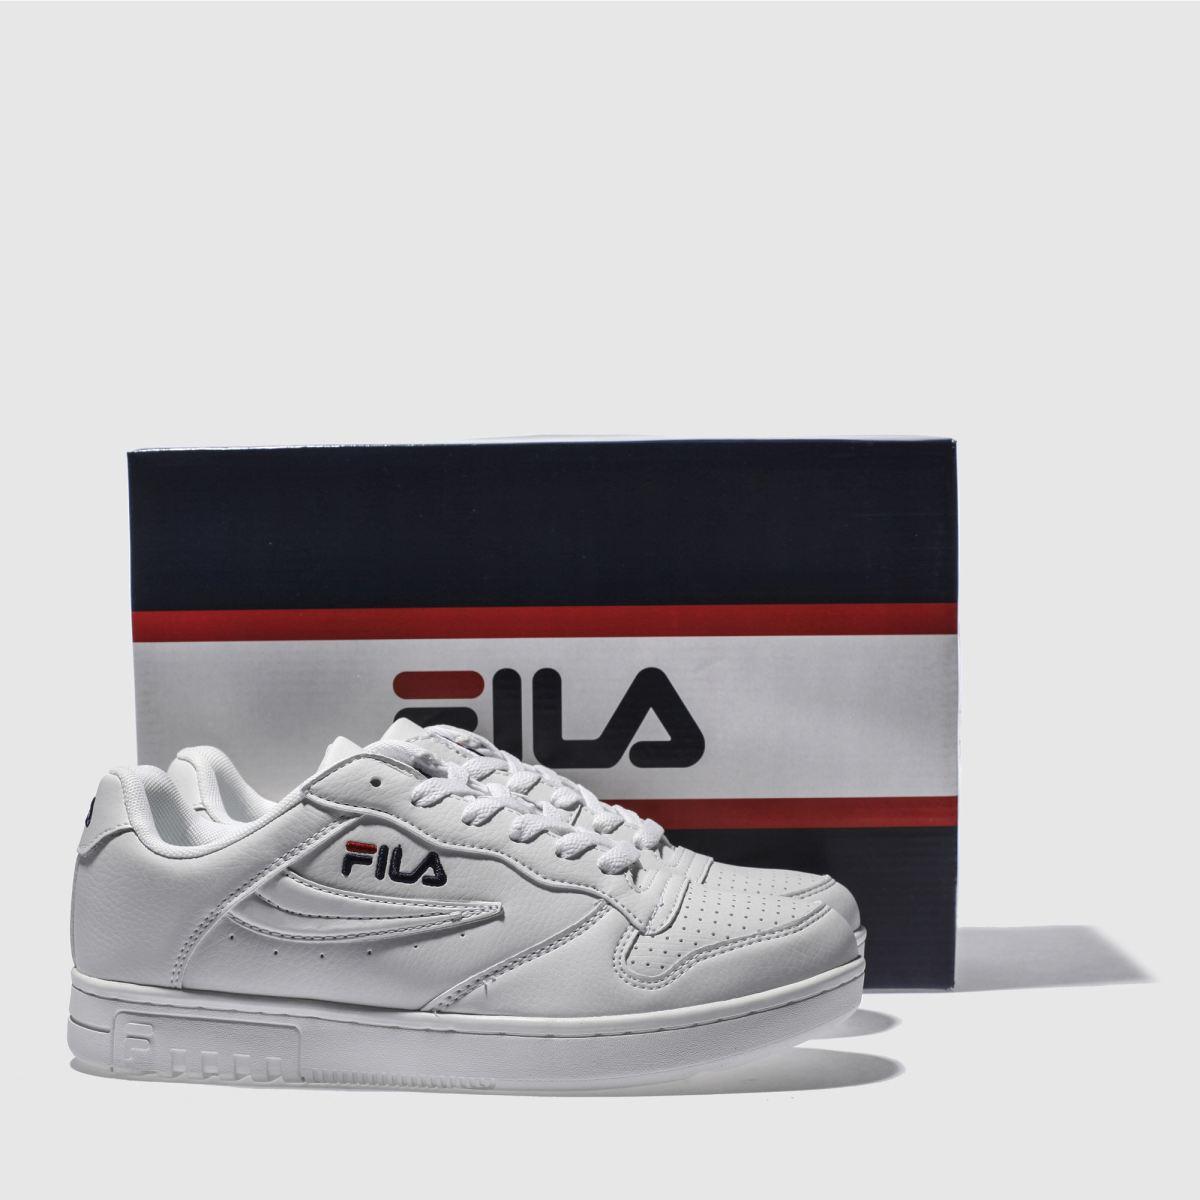 Damen Weiß Gute fila Fx100 Low Sneaker   schuh Gute Weiß Qualität beliebte Schuhe 094b03